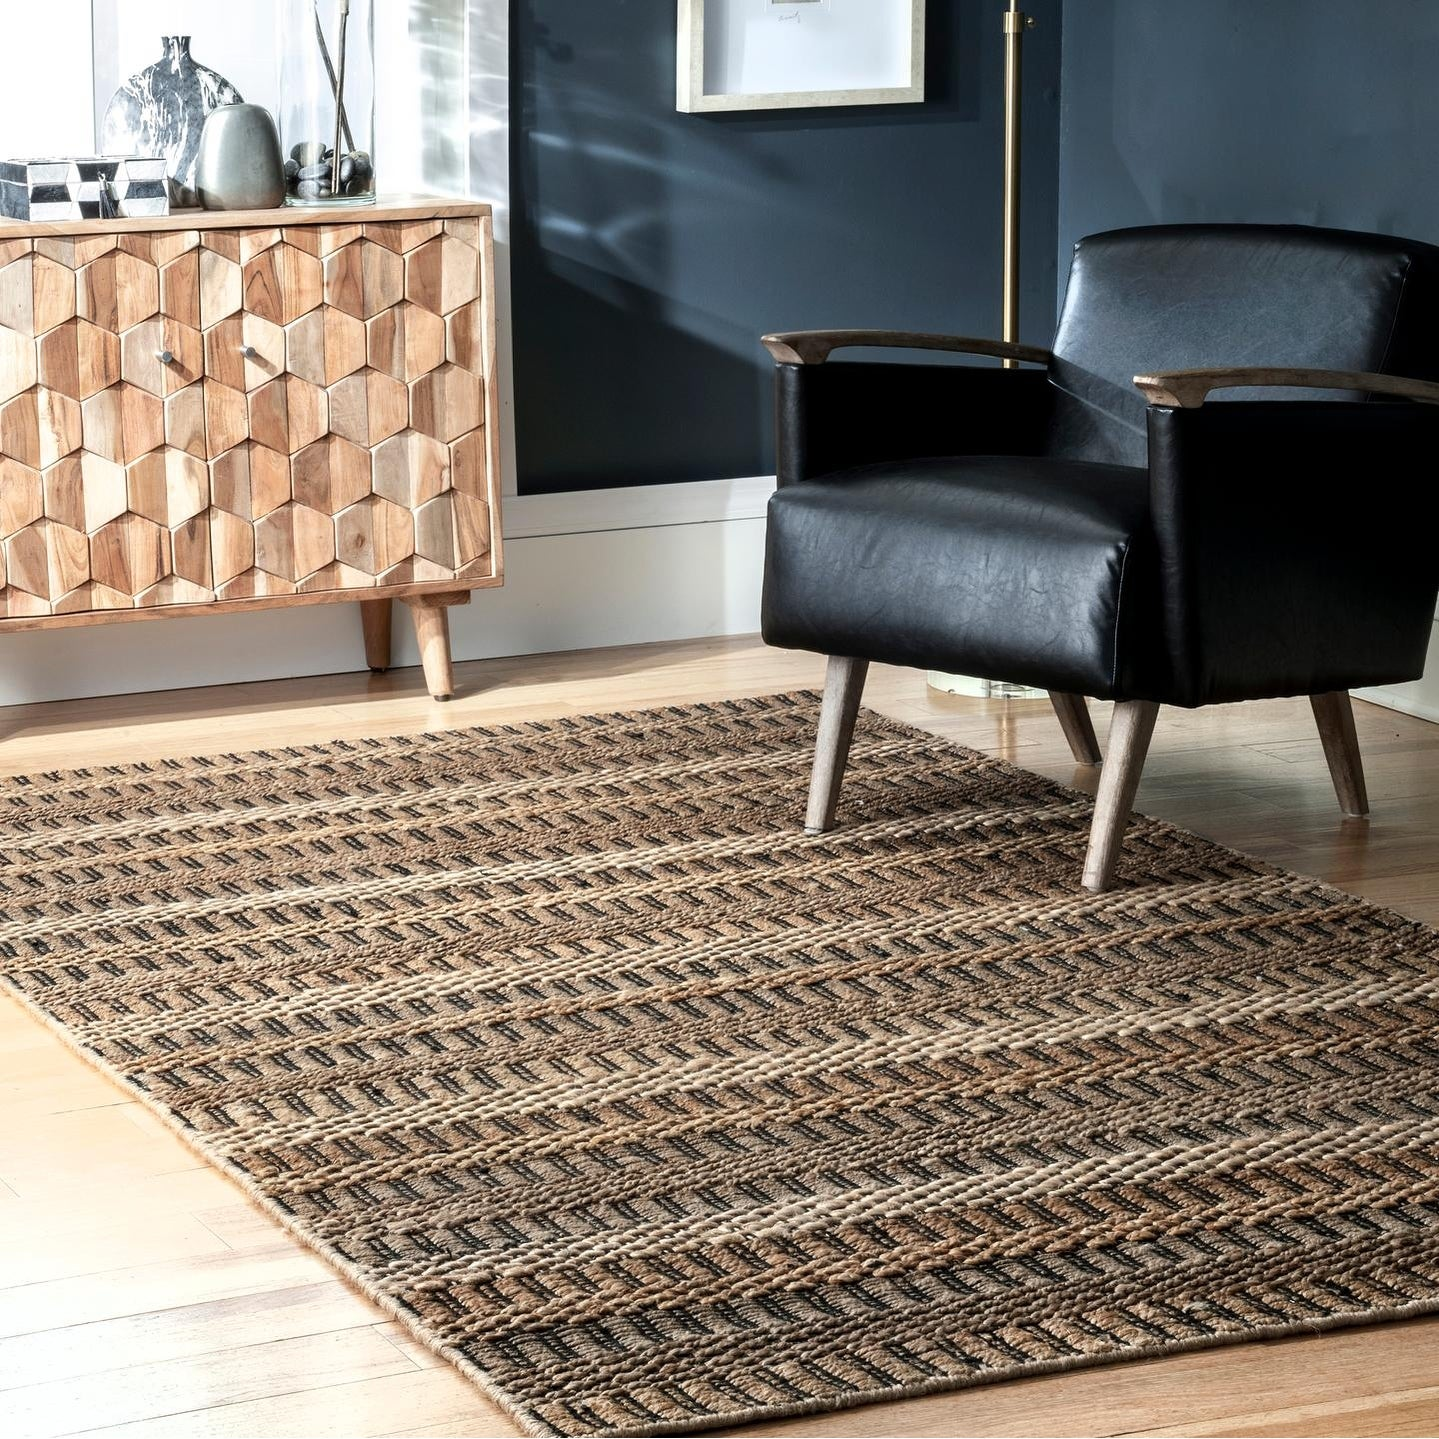 Nuloom Coraline Jute Striped Basketweave Area Rug On Sale Overstock 30595460